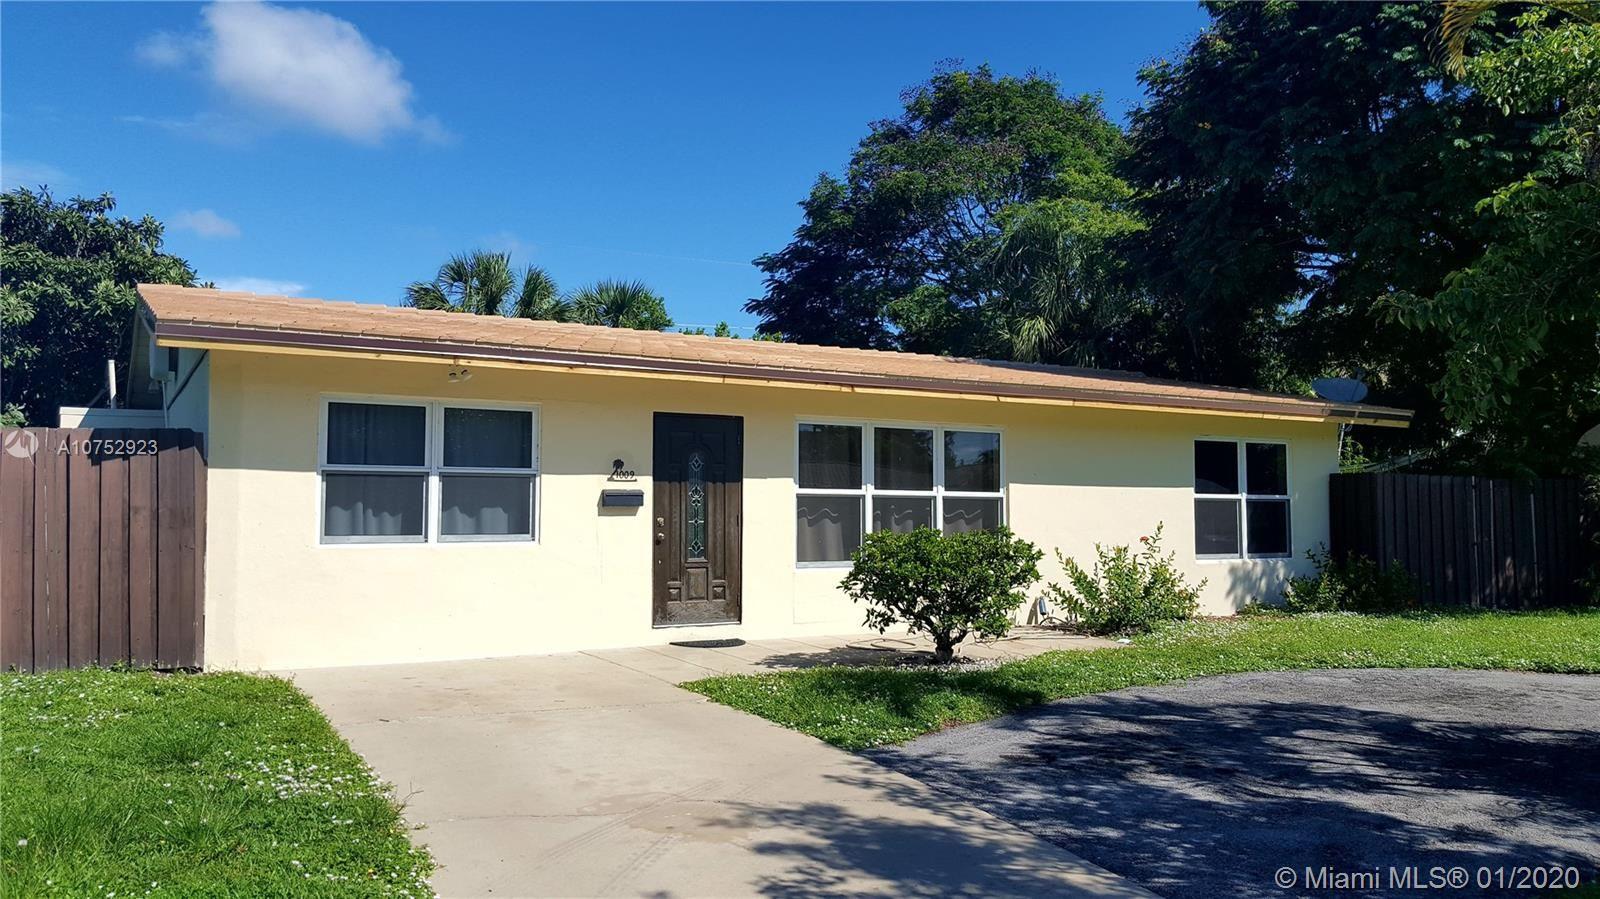 1009 SE 7th Street, Deerfield Beach, FL 33441 - MLS#: A10752923